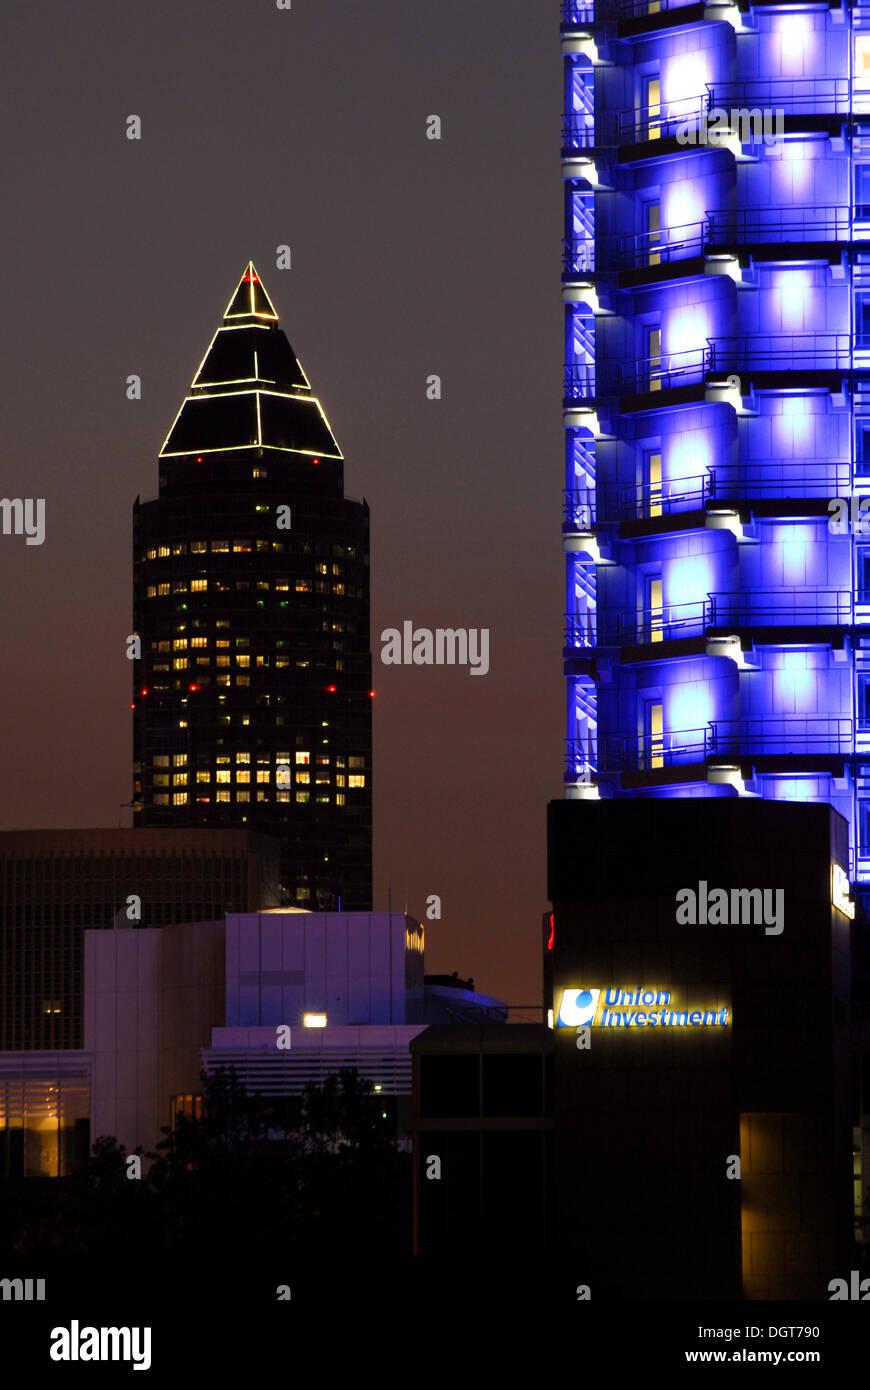 Messeturm fair tower by architect Helmut Jahn, Union Investment office building illuminated in blue, Bahnhofsviertel Stock Photo